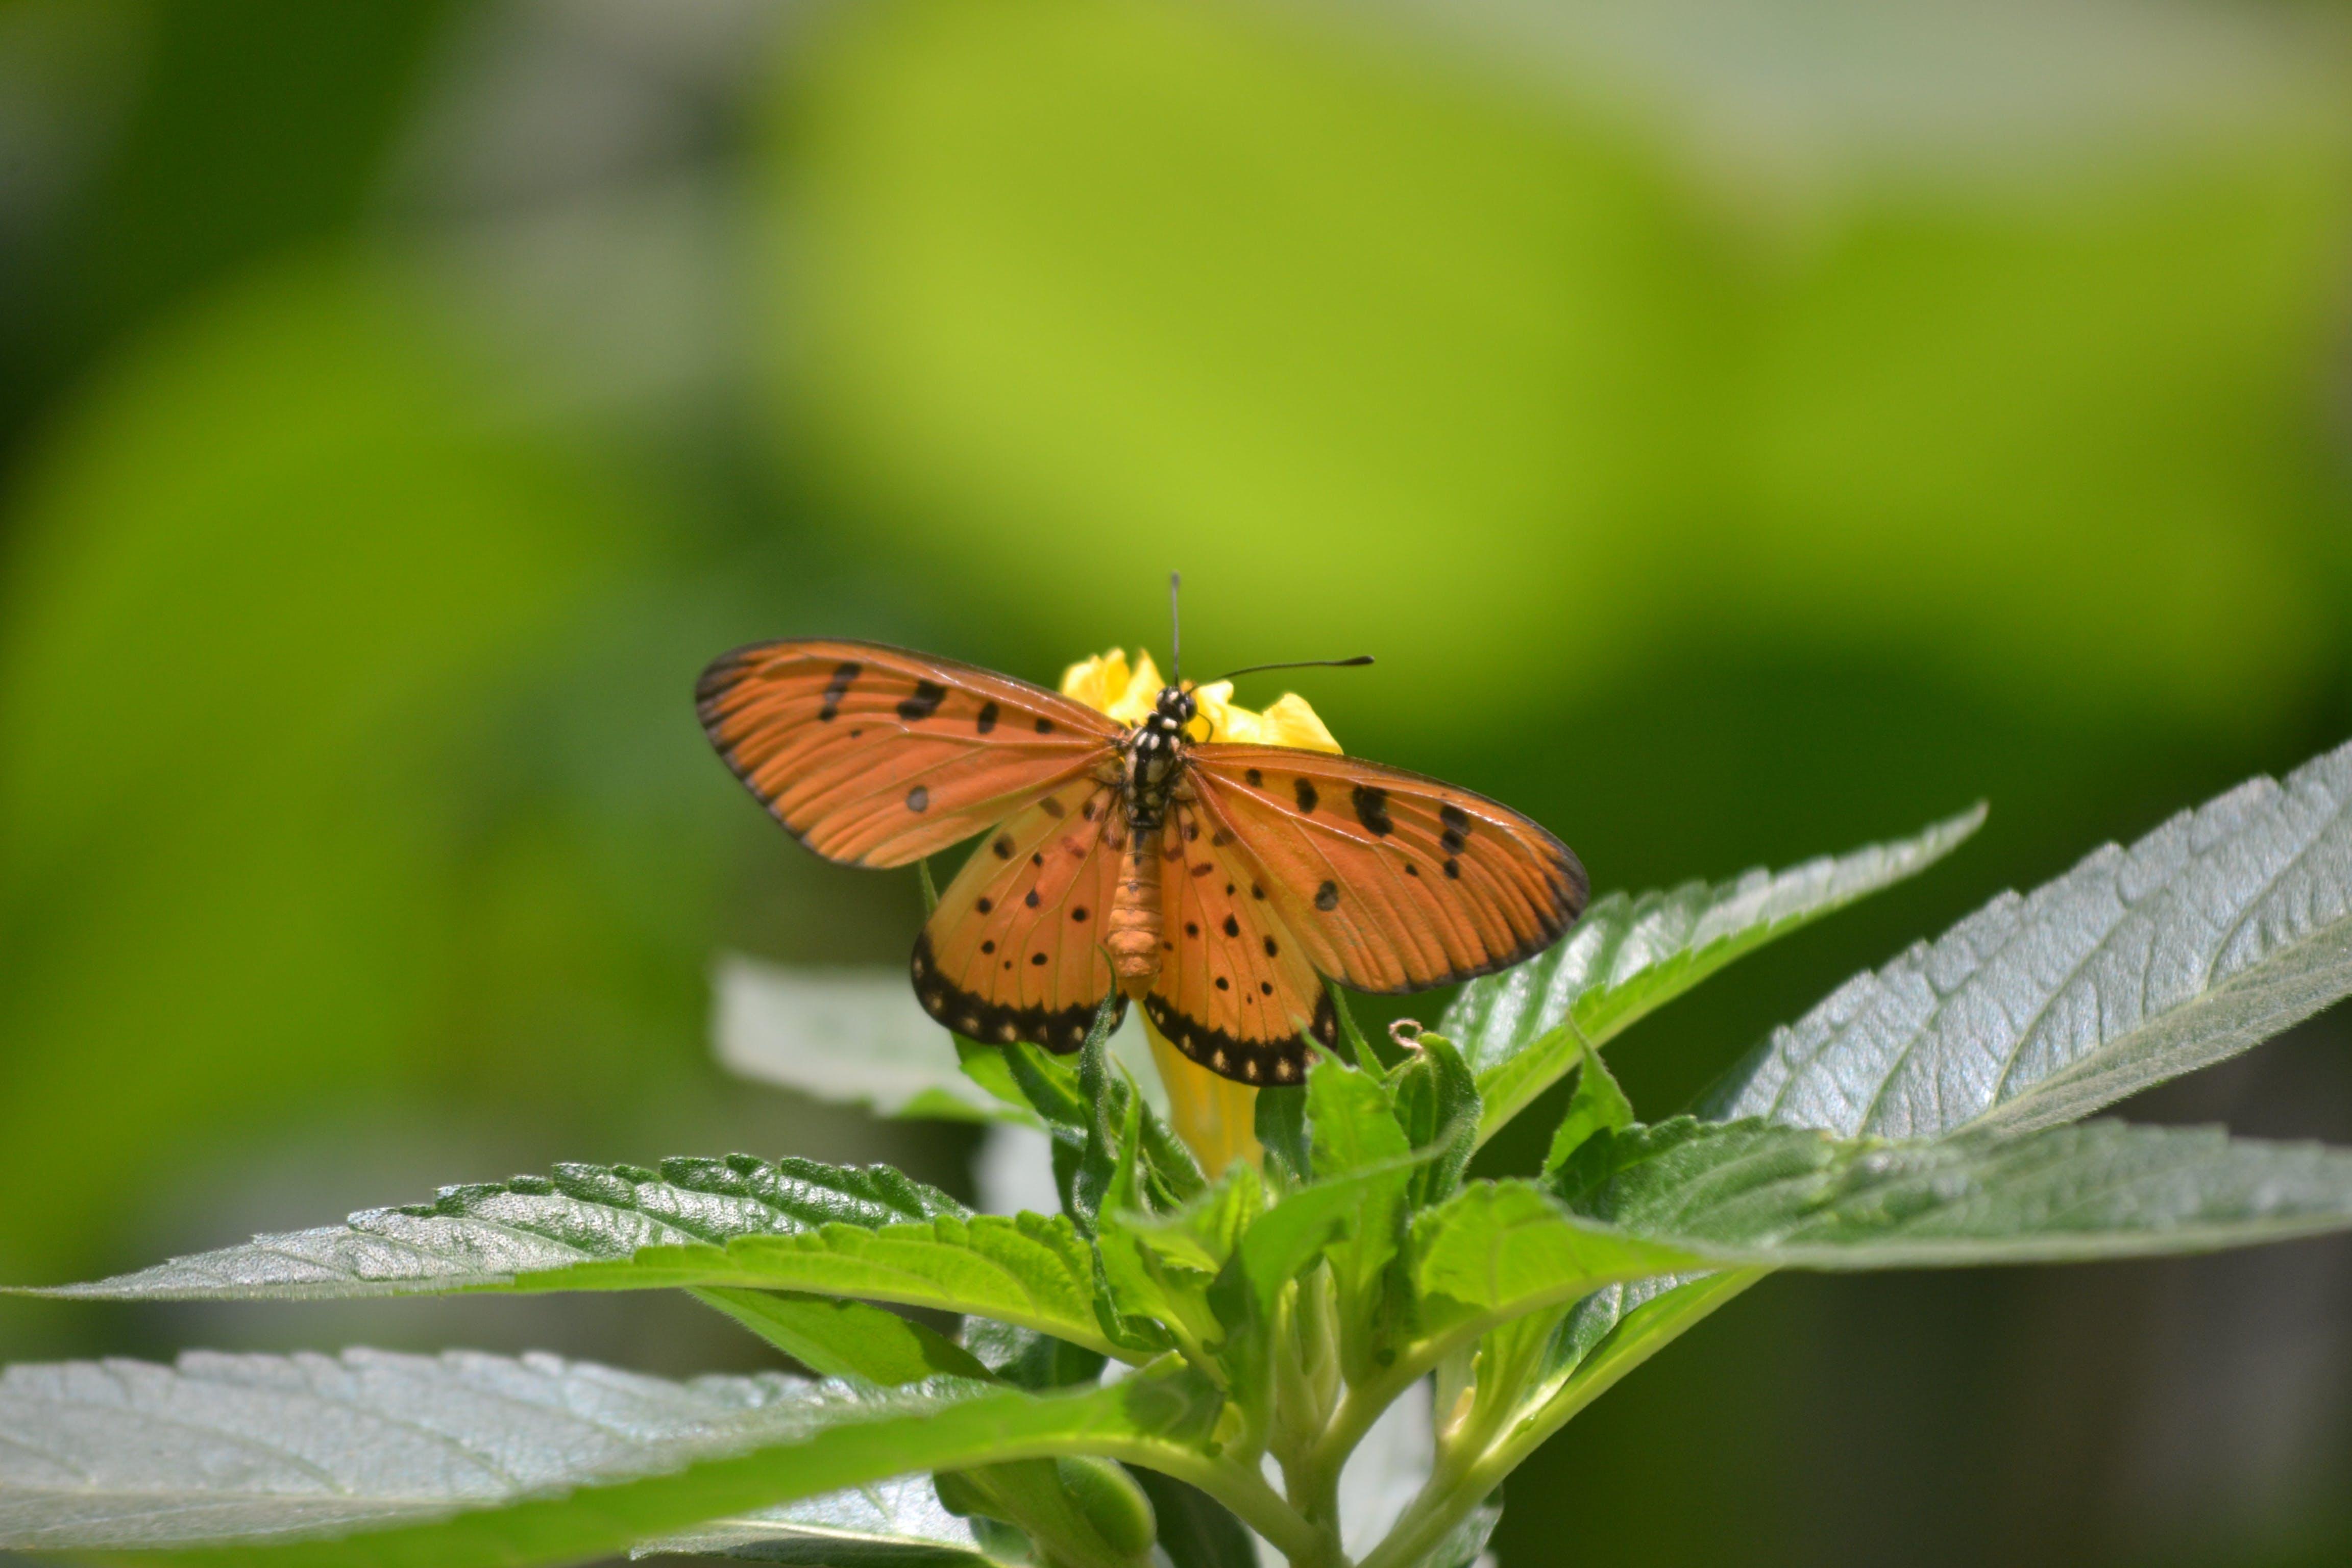 Free stock photo of Adobe Photoshop, butterfly on a flower, nikon camera, sunny day